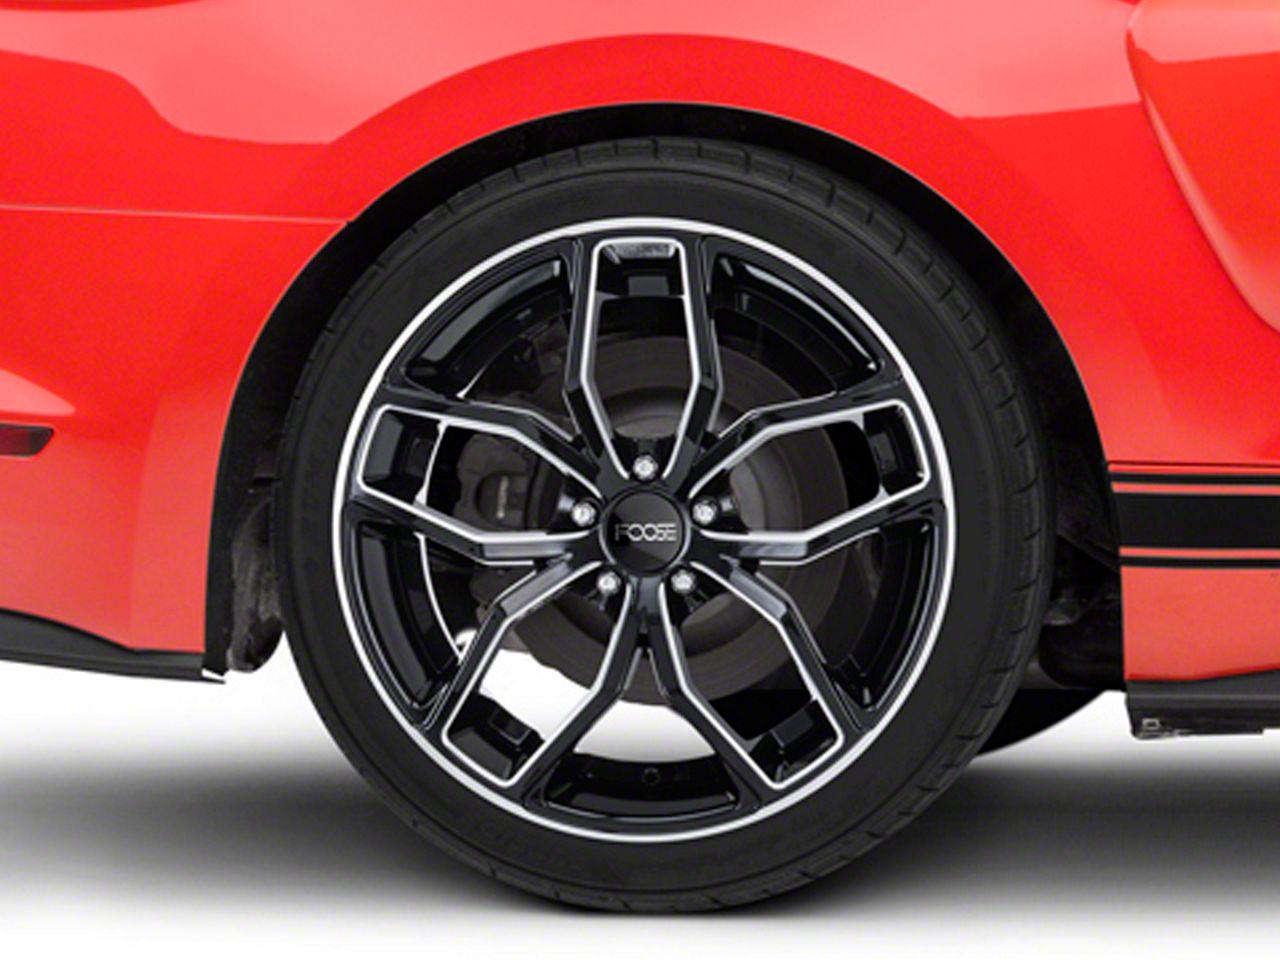 Foose Outcast Black Machined Wheel - 20x10 - Rear Only (15-19 GT, EcoBoost, V6)